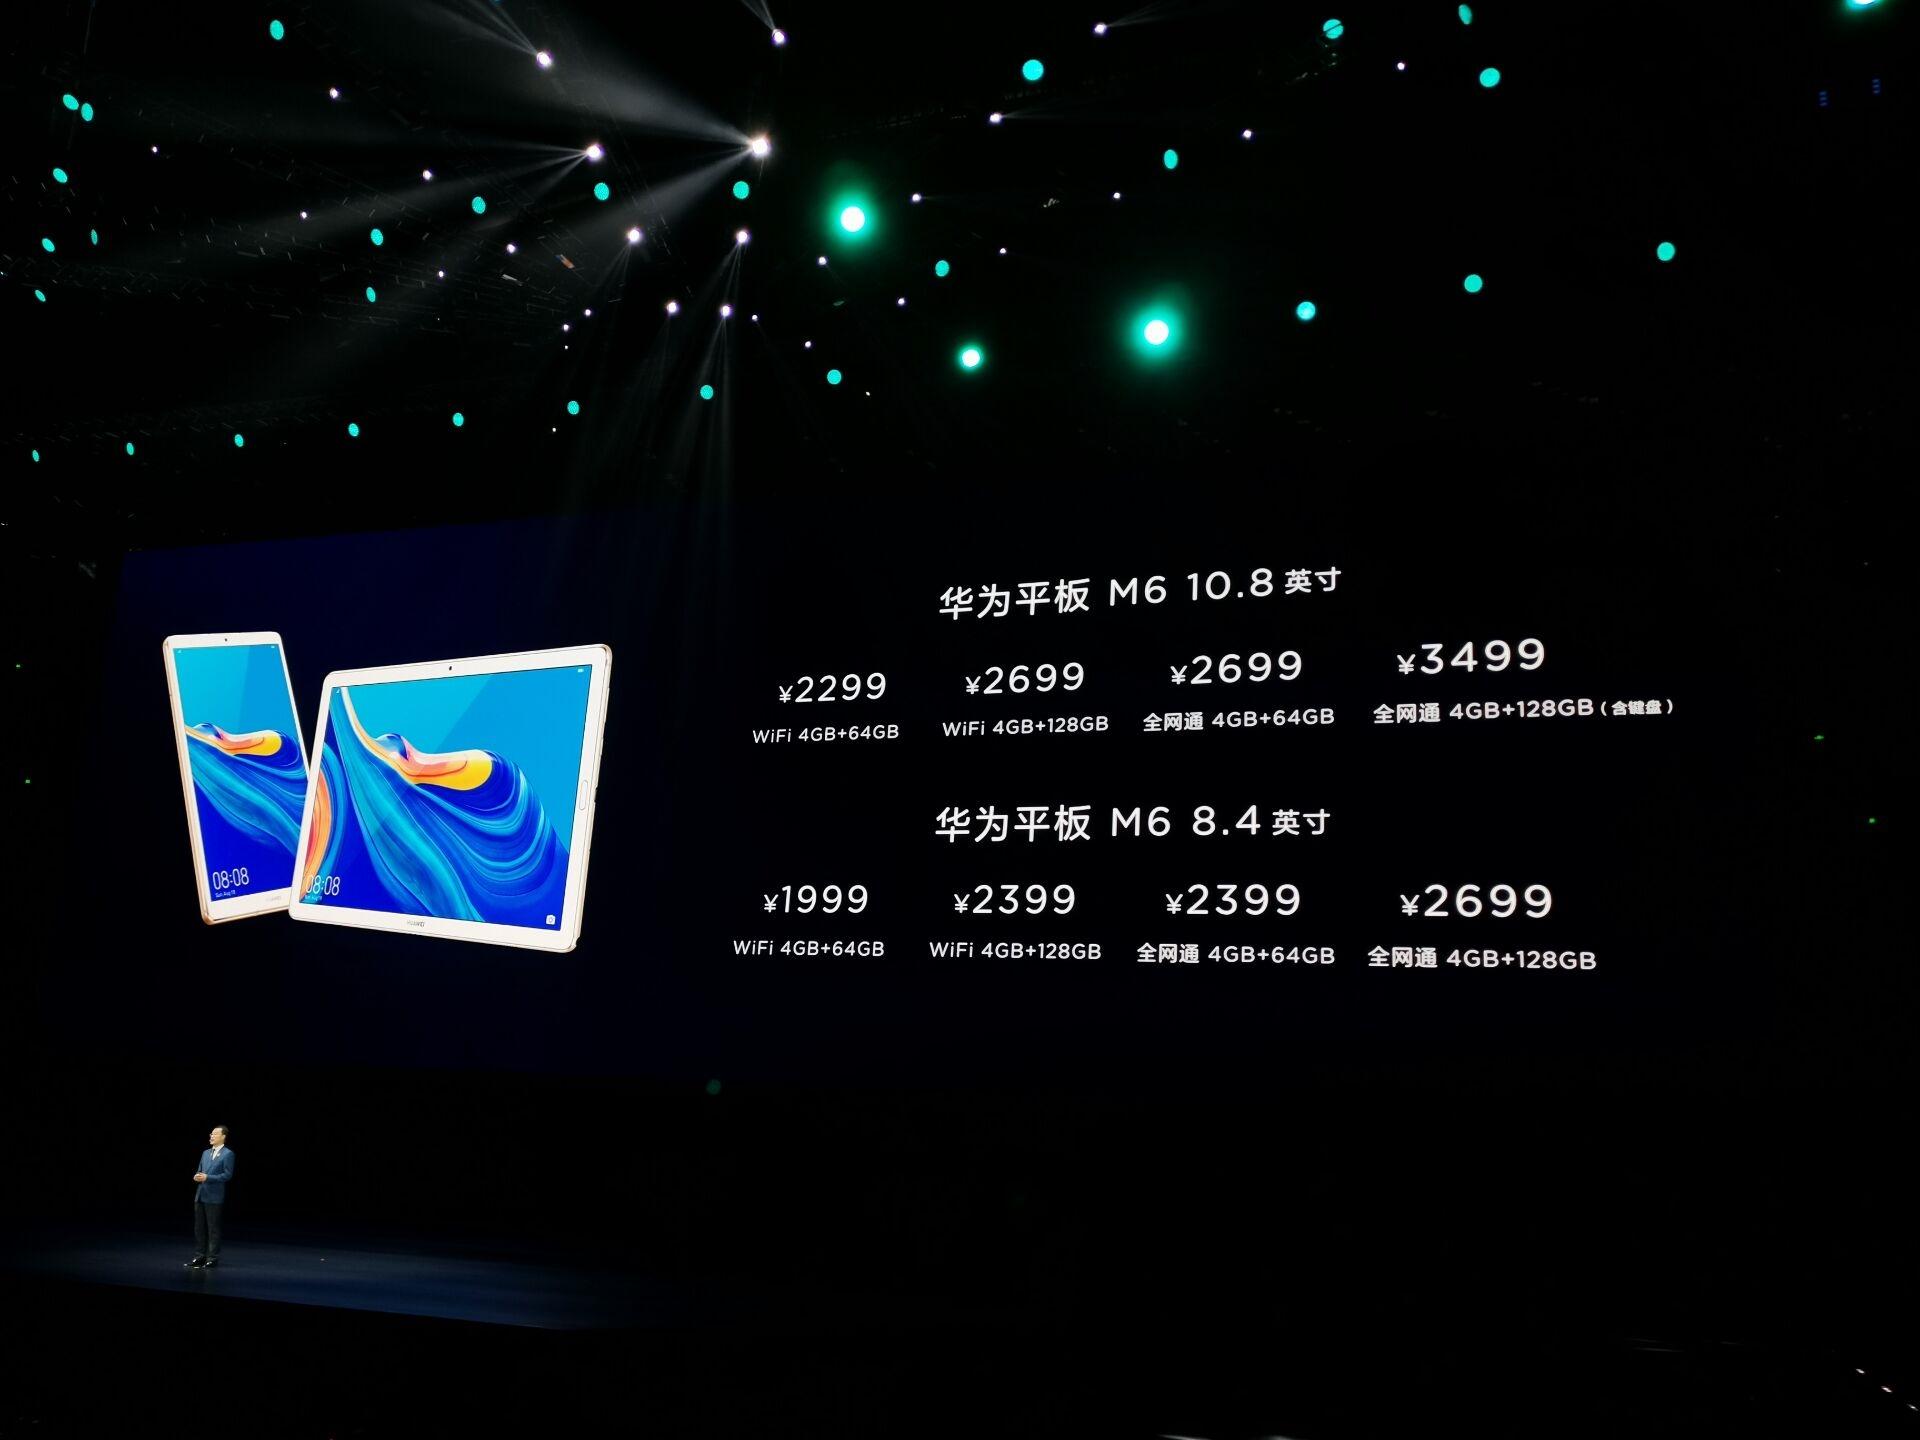 Sforum - Latest MediaPad-M6-ra-mat-1 information page Huawei MediaPad M6 launches: iPad-like design, Kirin 980 run, 2K display, priced at only 6.7 million